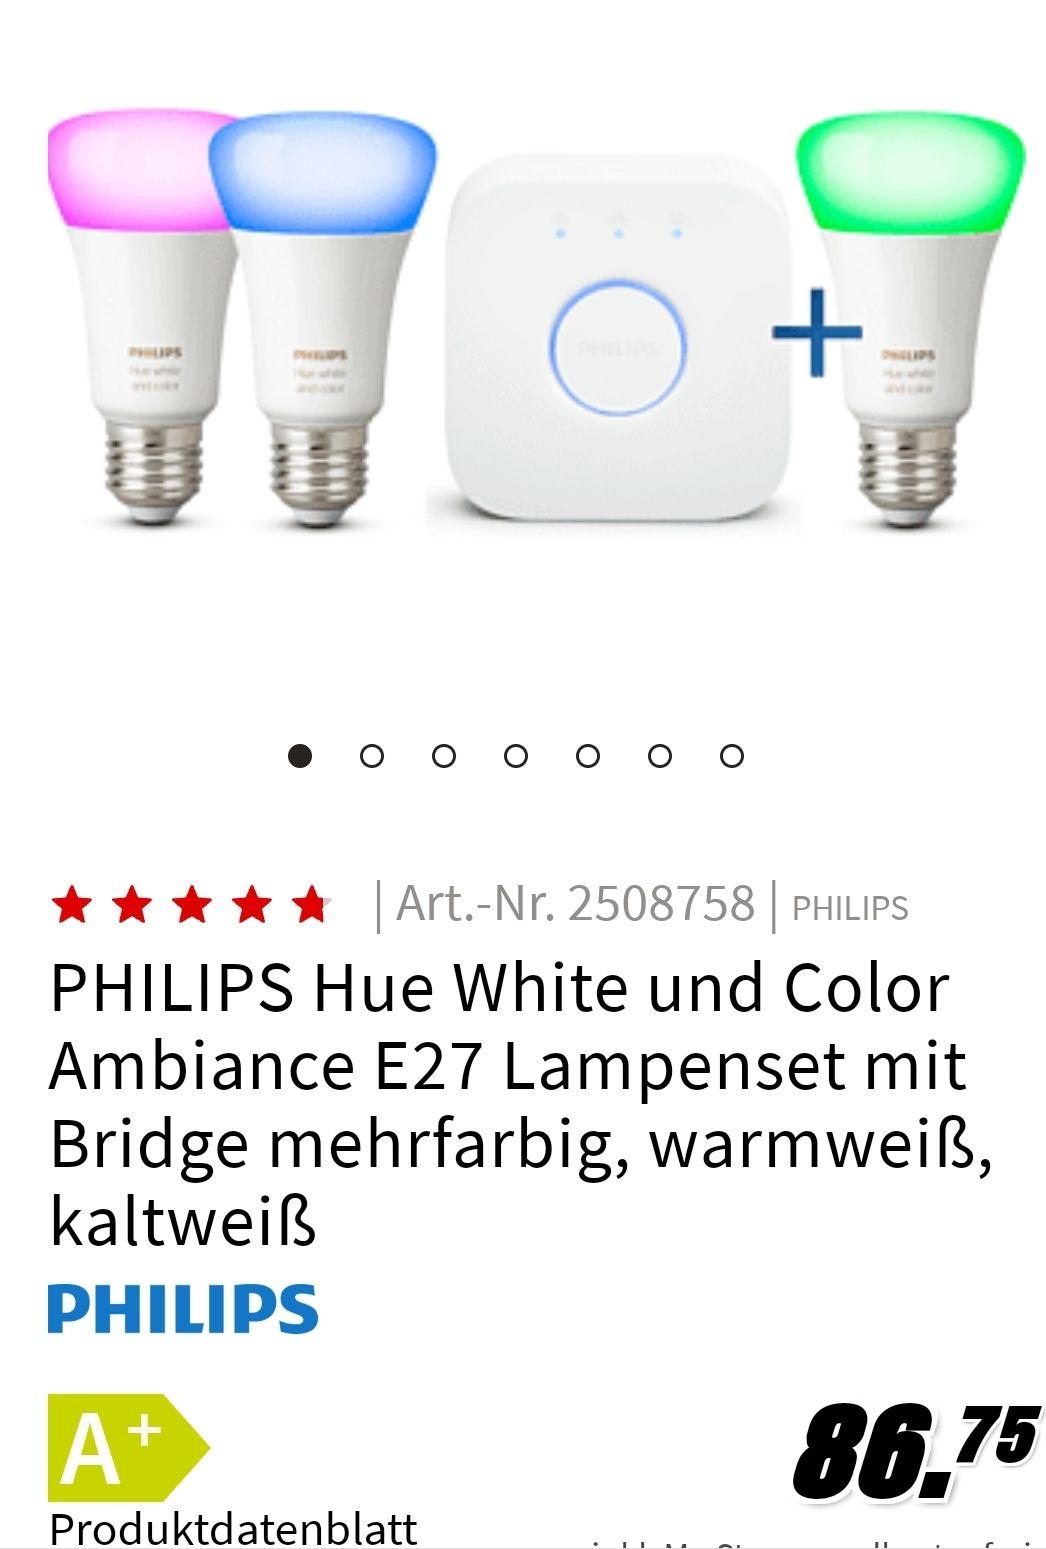 [GRENSDEAL] Hue 3x e27 kleur+Bridge 86,75 @ Mediamarkt Duitsland